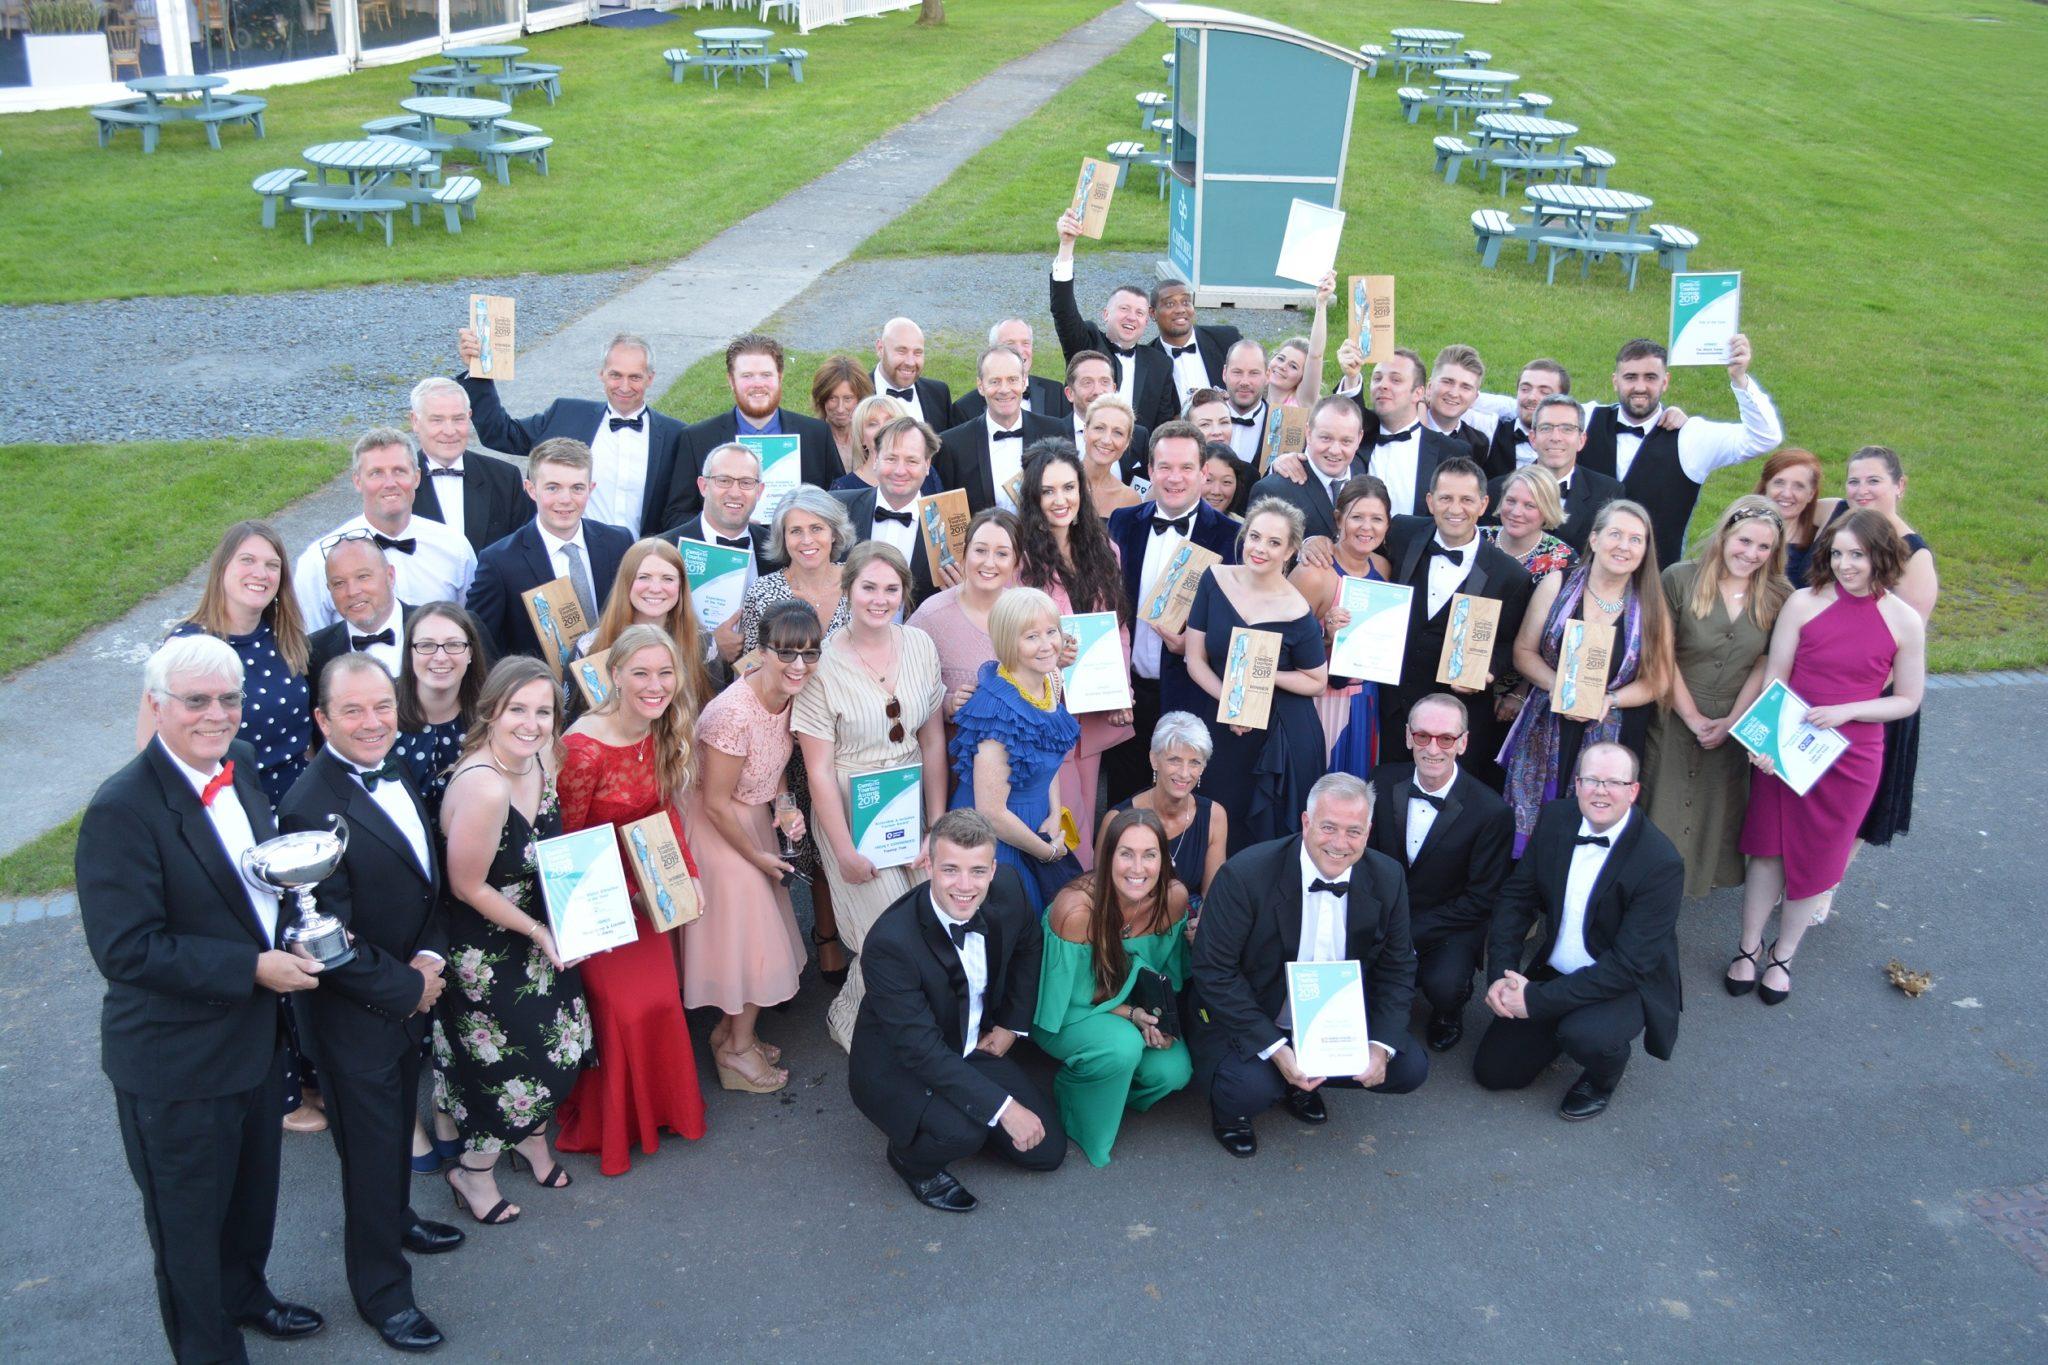 Cumbria Tourism Award winners 2019